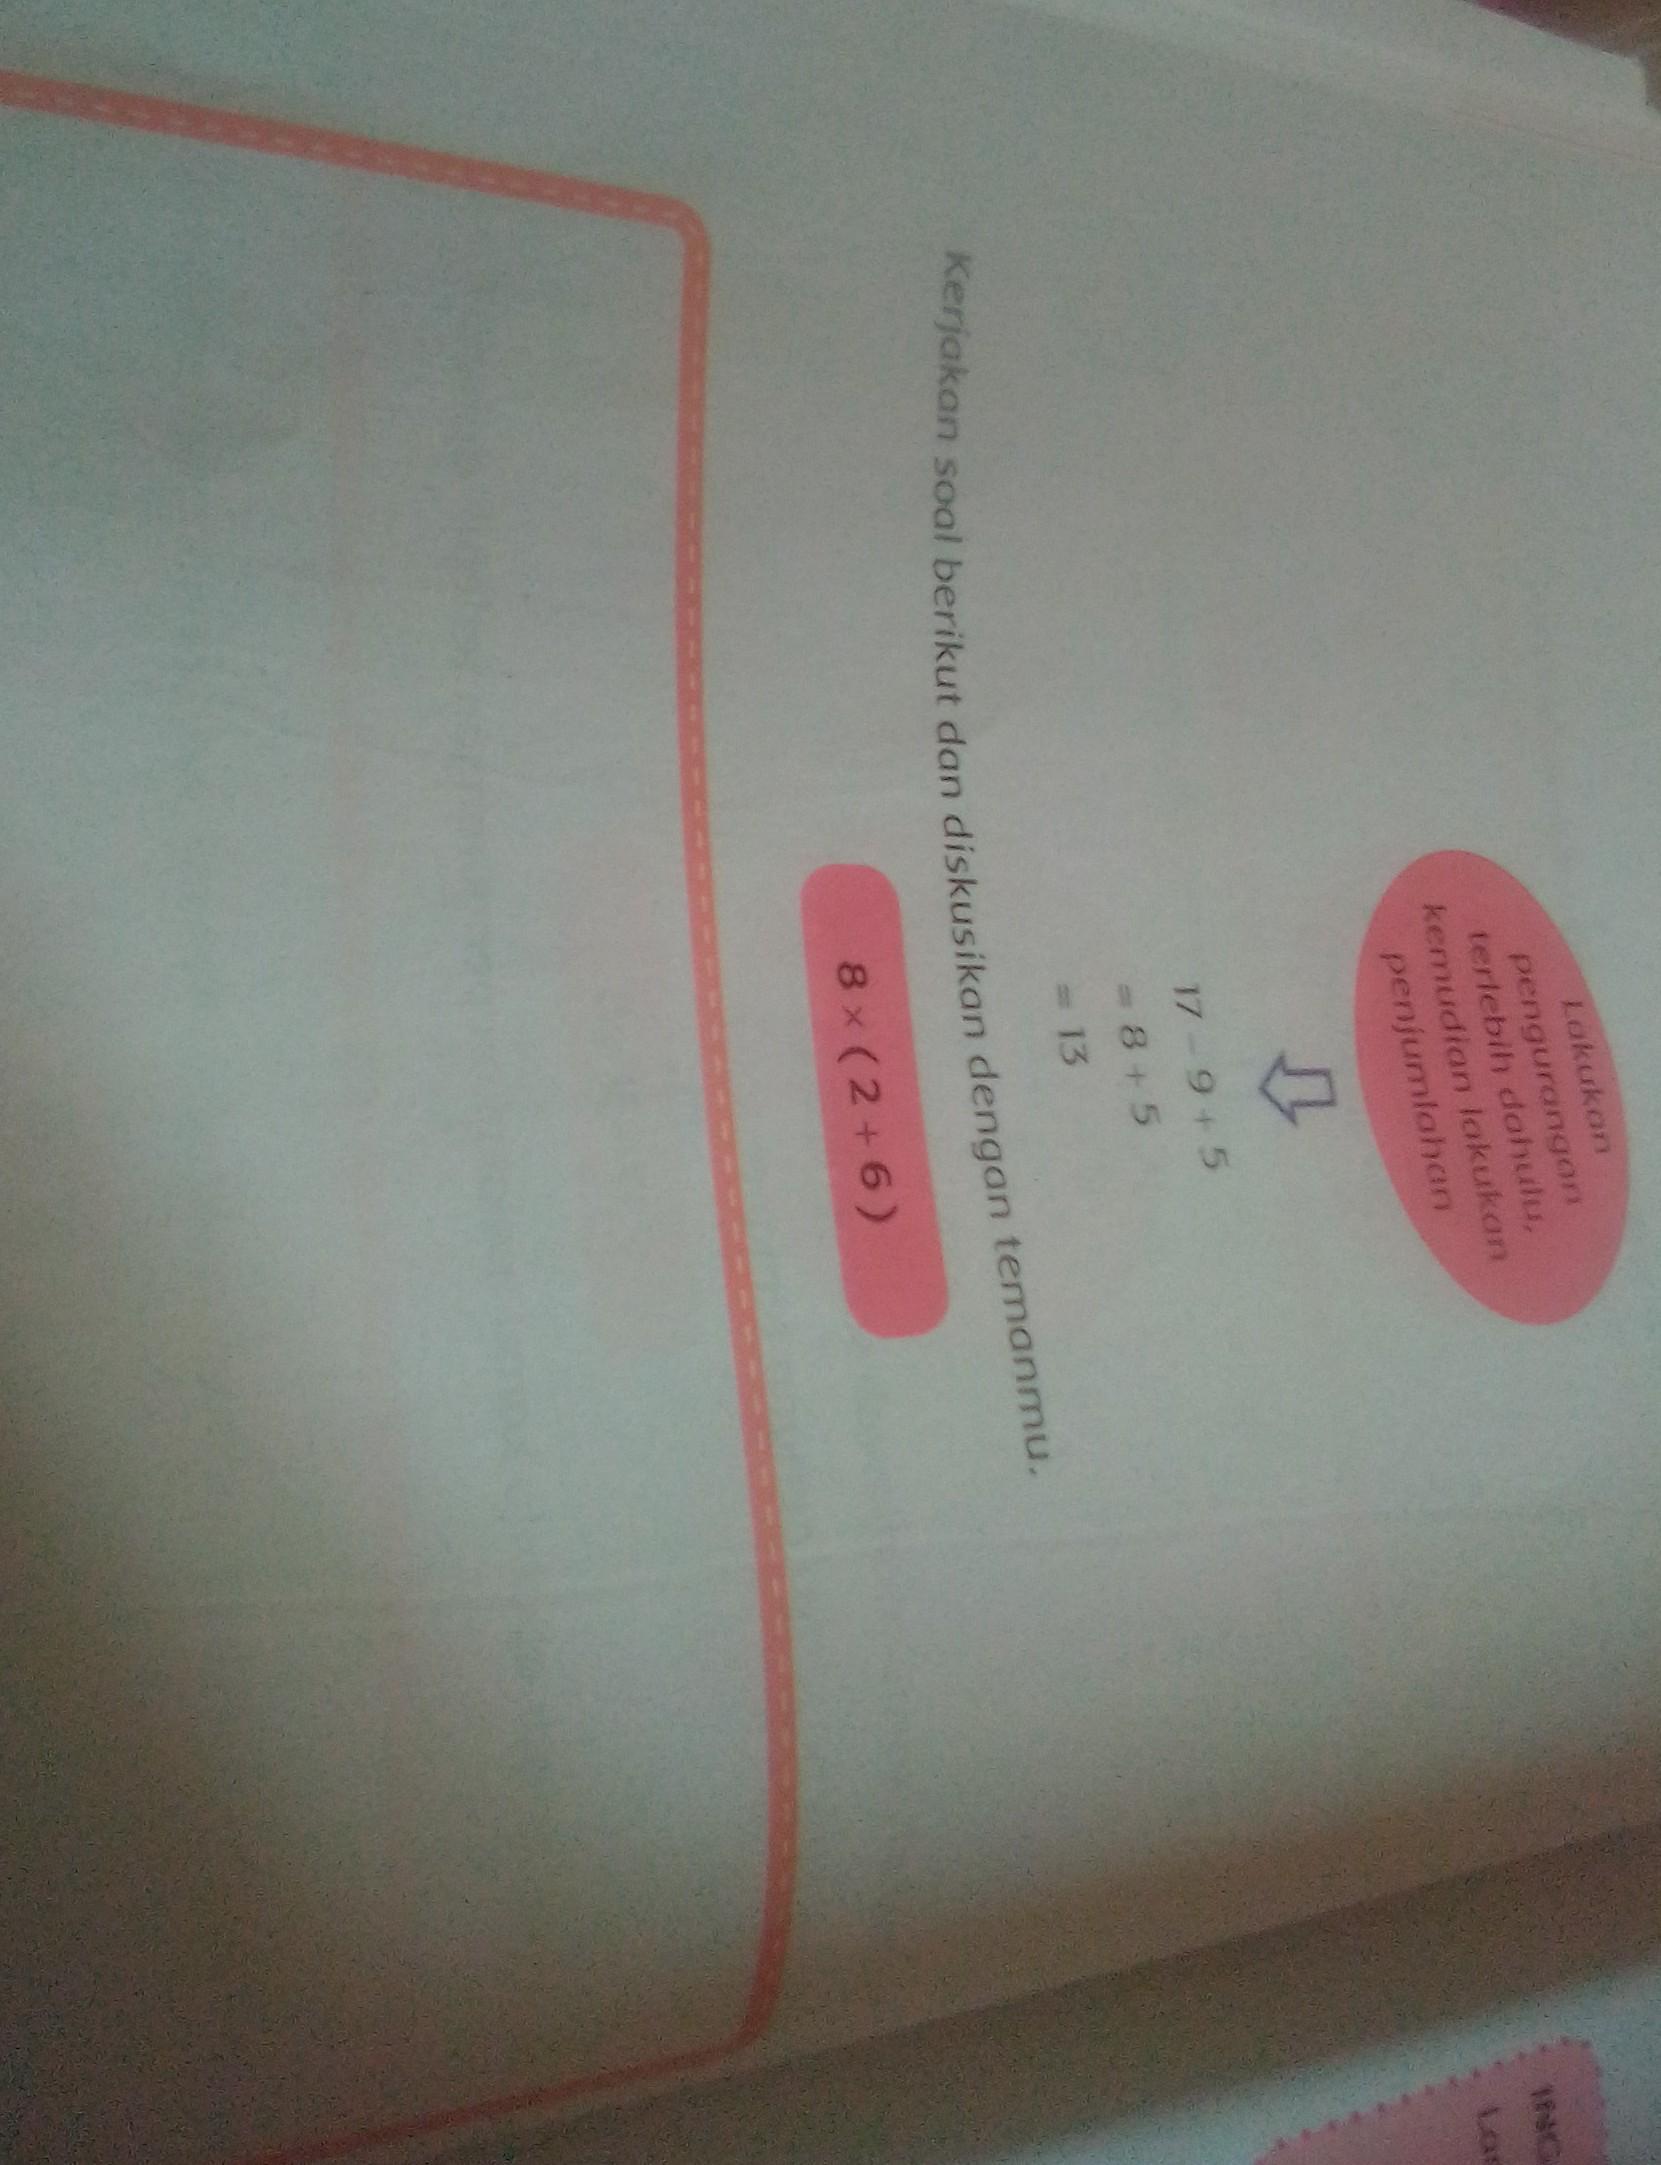 Jawaban Buku Tematik Tema 1 Kelas 6 Selamatkan Mahluk Hidup Halaman 83 Yg Atas Brainly Co Id